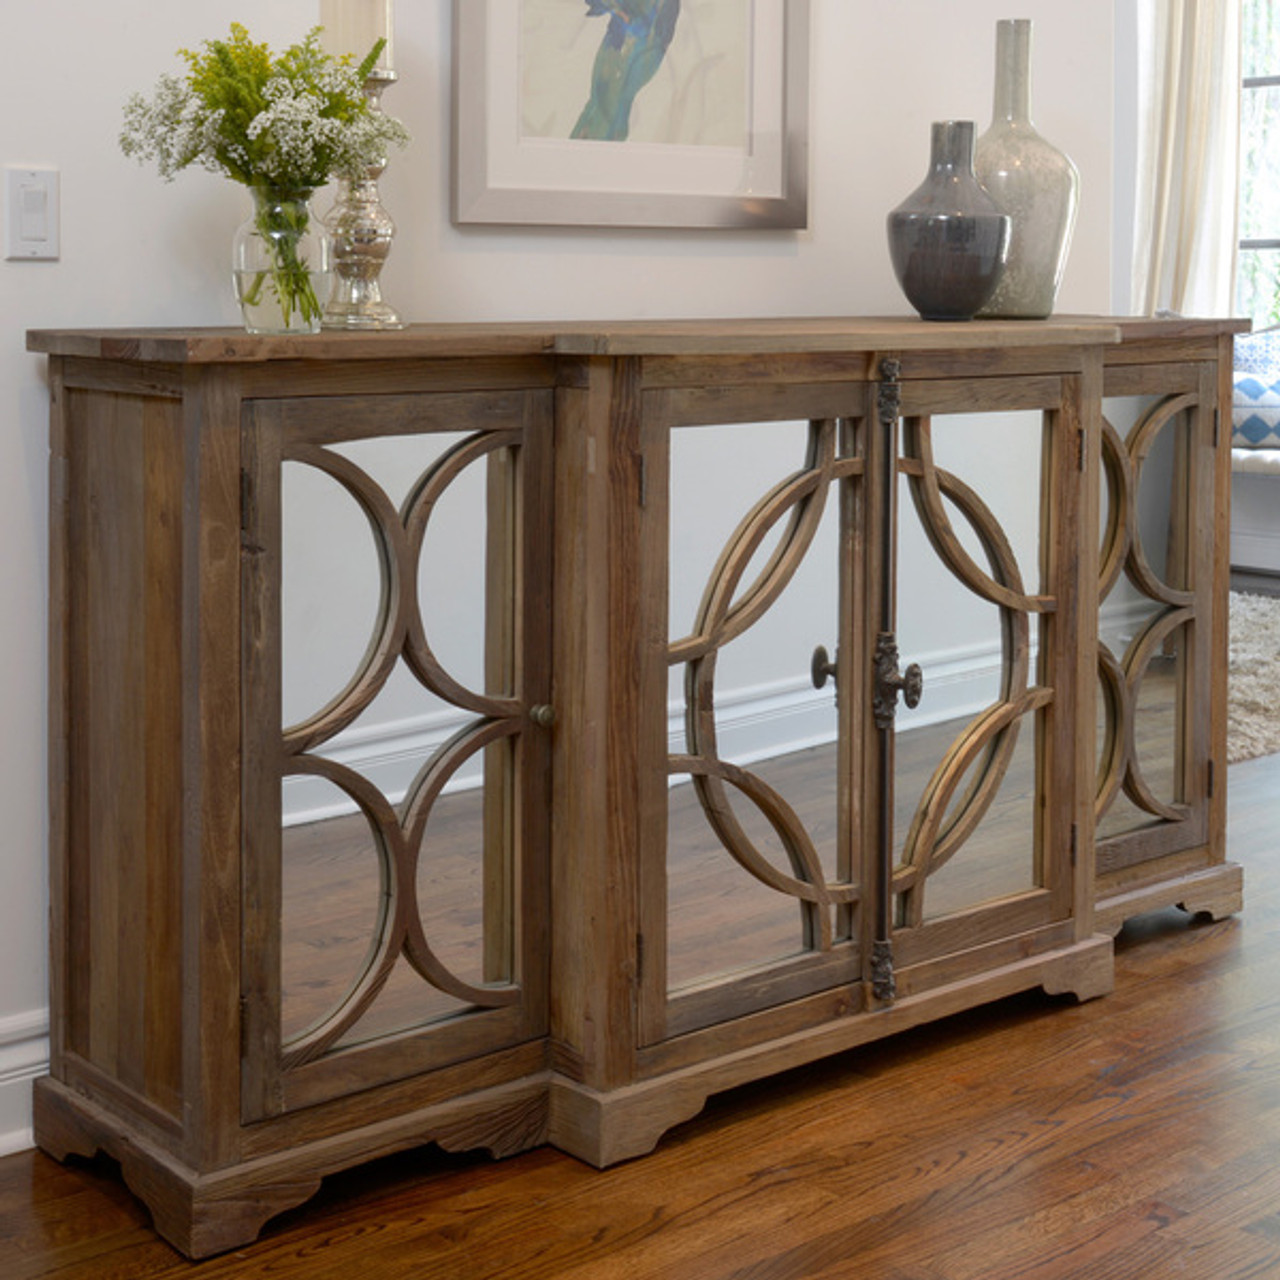 Wells Reclaimed Elm Wood Mirrored Sideboard - Wells Reclaimed Elm Wood Mirrored Sideboard Buffet Zin Home